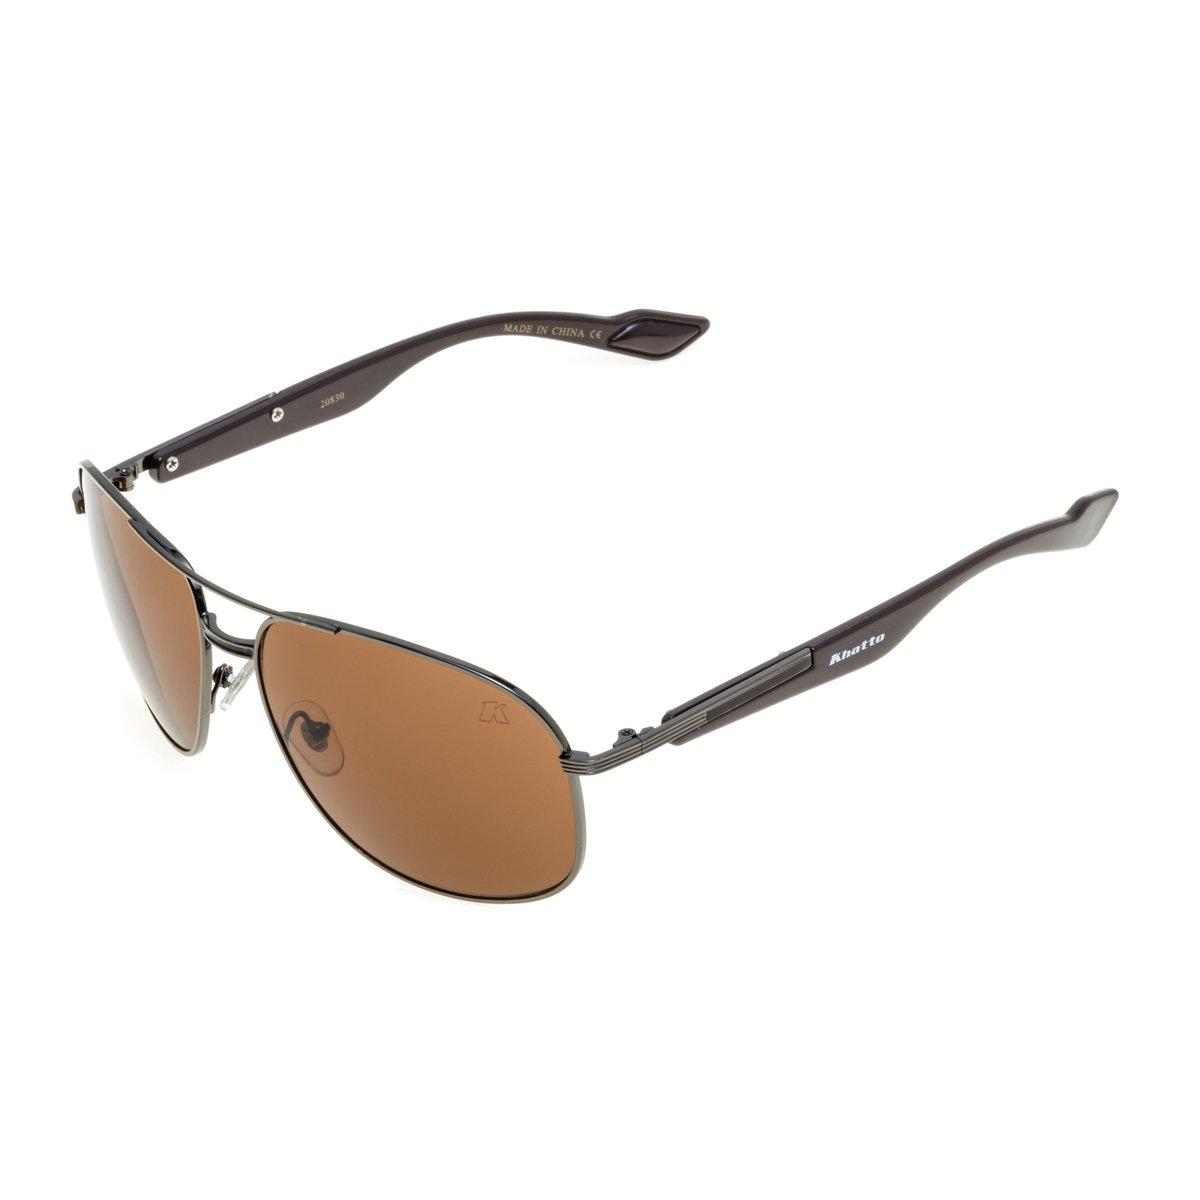 599c866c4f04e Óculos de Sol Khatto KT20830 - Compre Agora   Netshoes